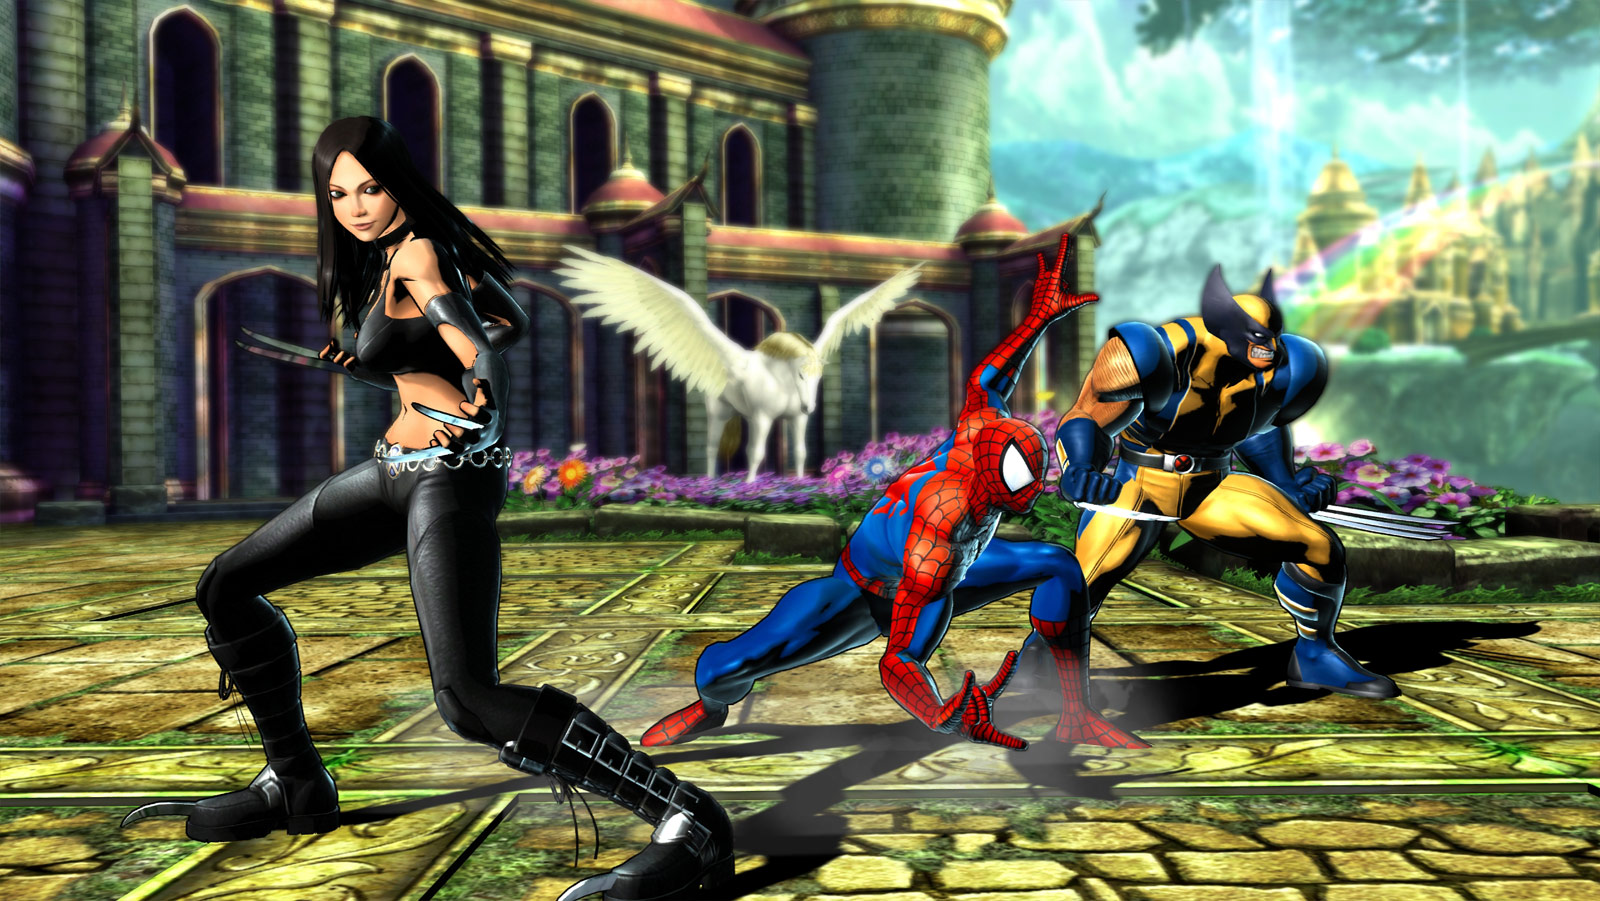 Marvel vs. Capcom 3 screen shot Sept. 21 image #1